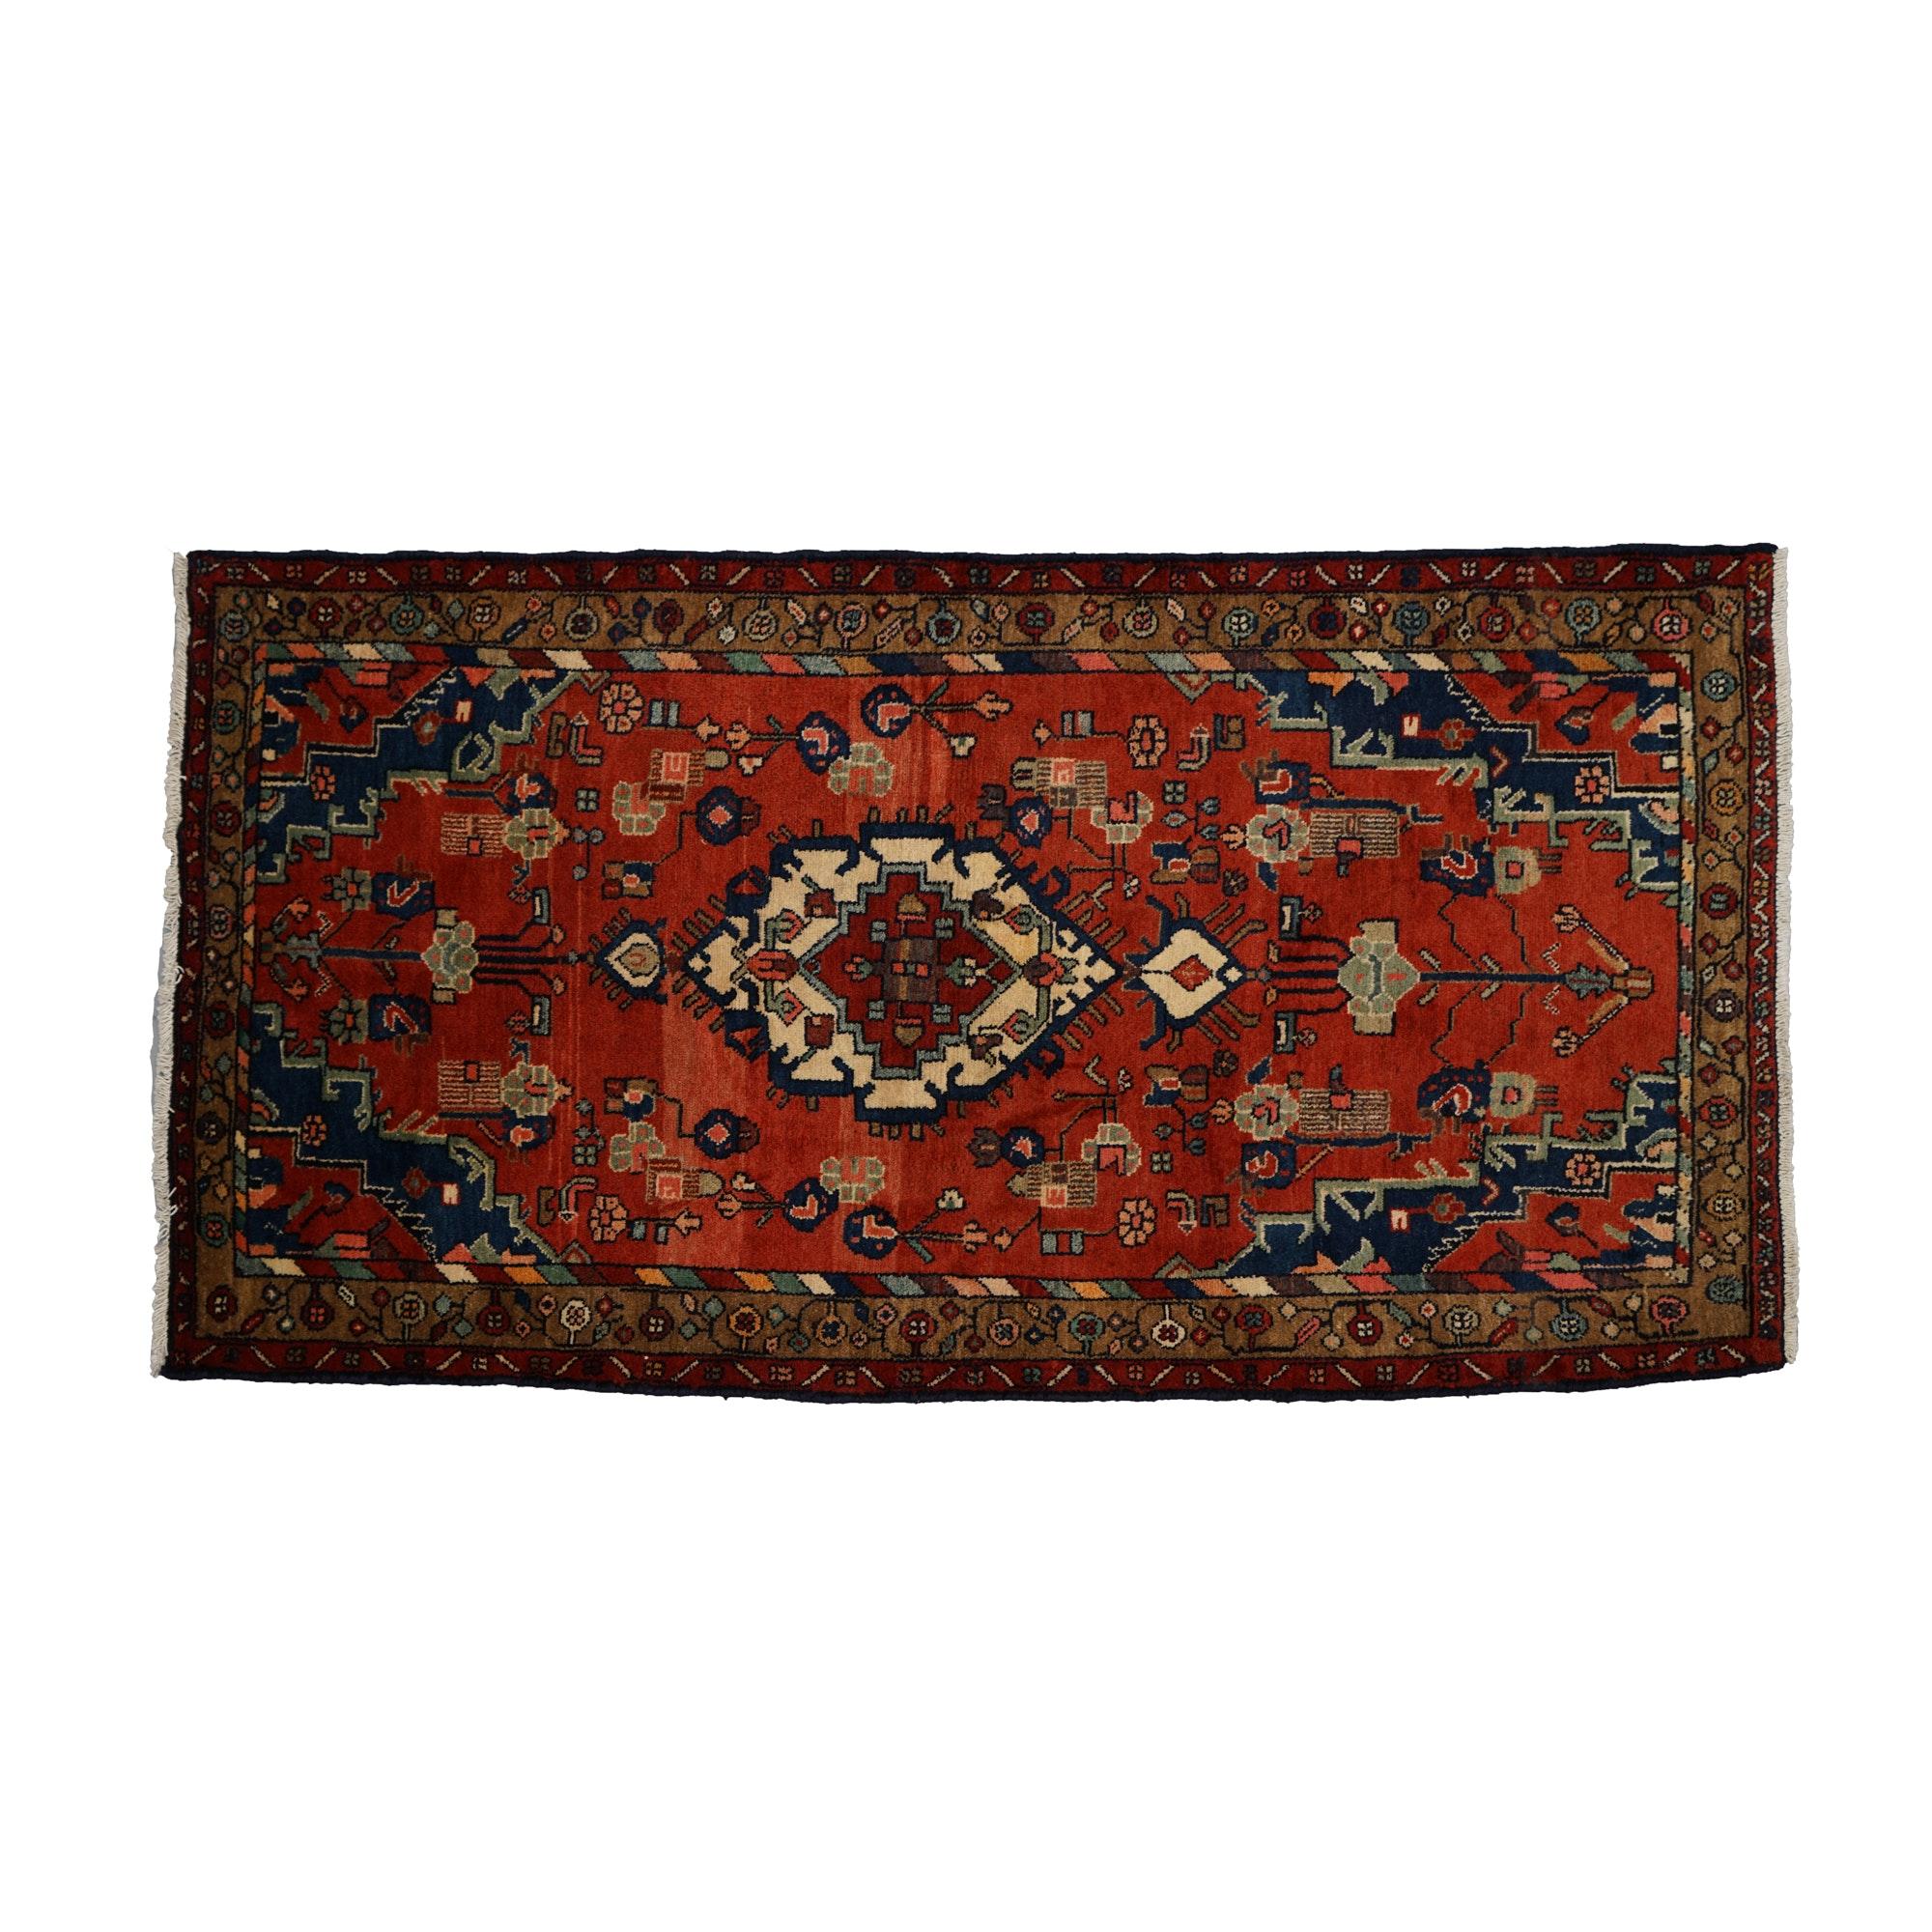 Hand-Knotted Persian Hamadan Area Rug